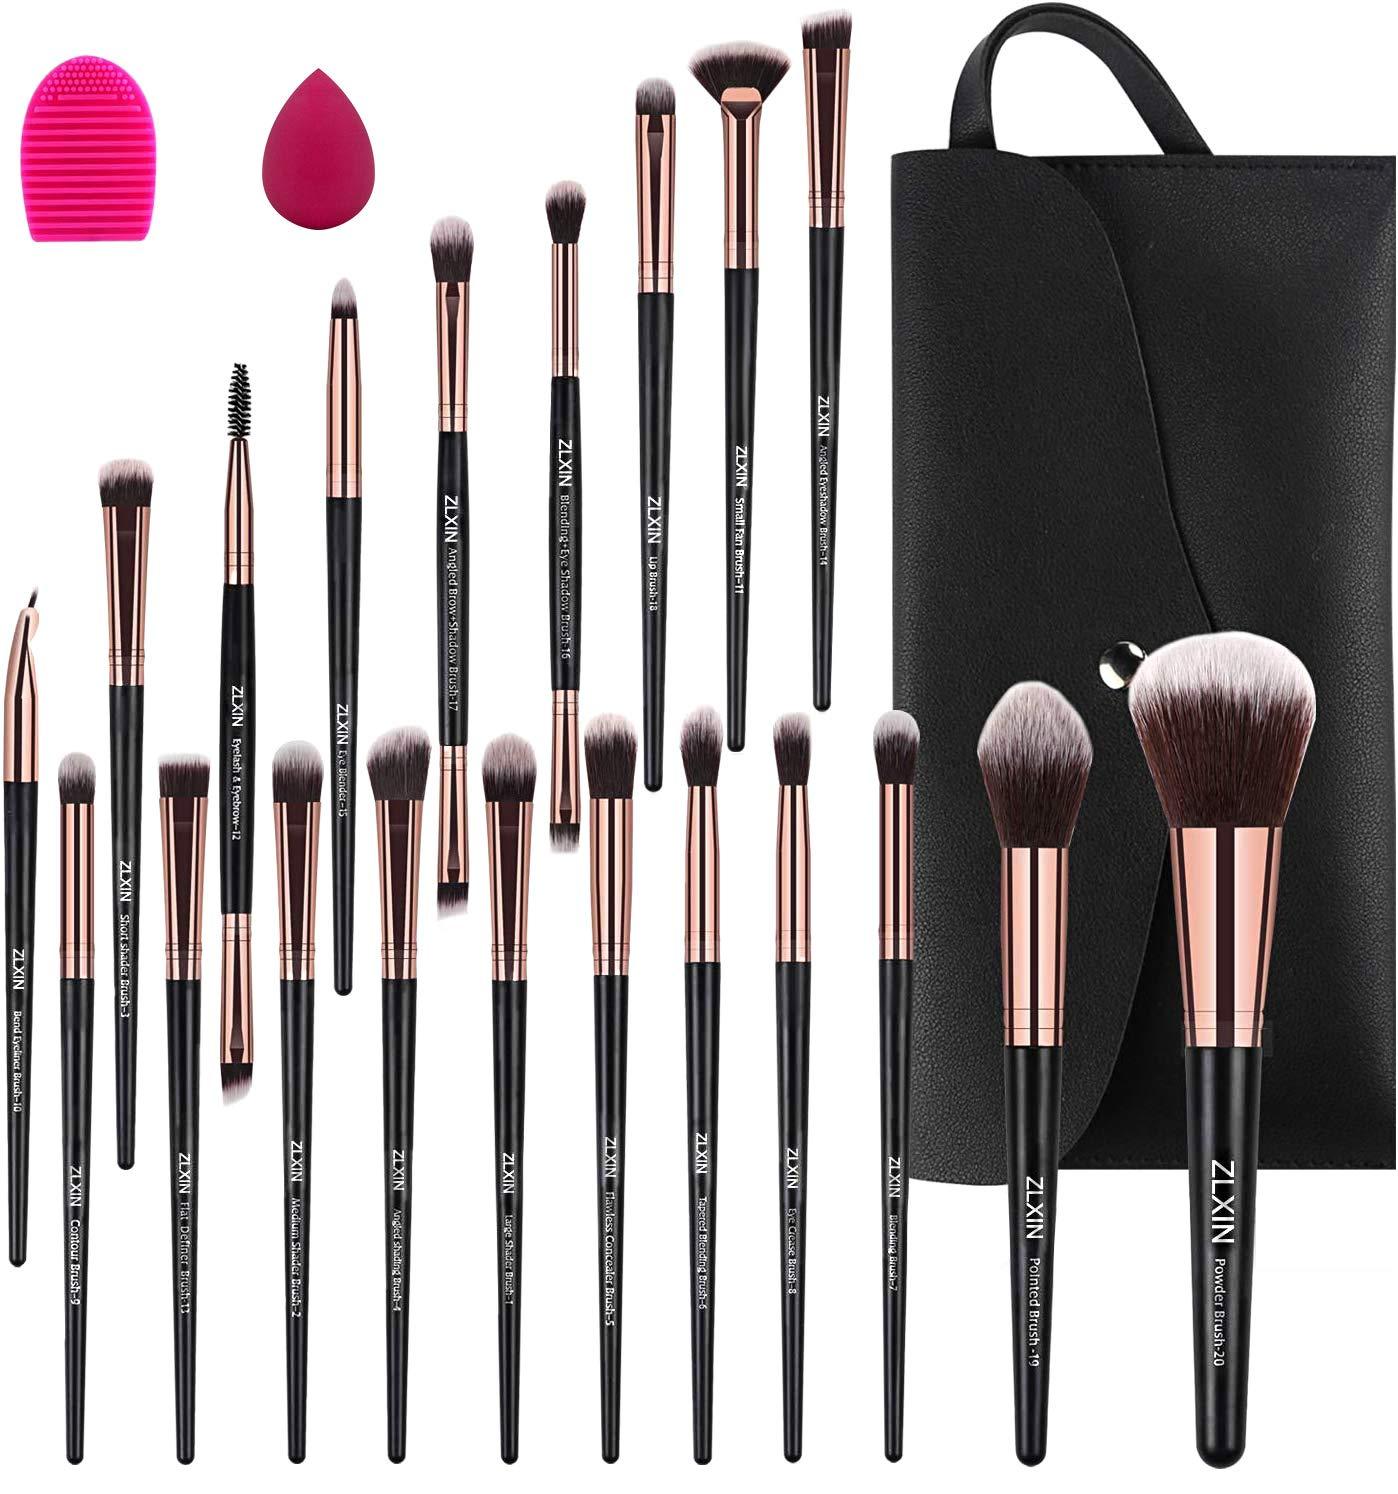 ZLXIN Makeup Brushes Set 23 Pcs Premium Synthetic Kabuki Foundation Face Powder Blush Concealers Eye Shadows Make Up Brushes Kit with Storage Bag Blender Sponge and Brush Cleaner (Black)